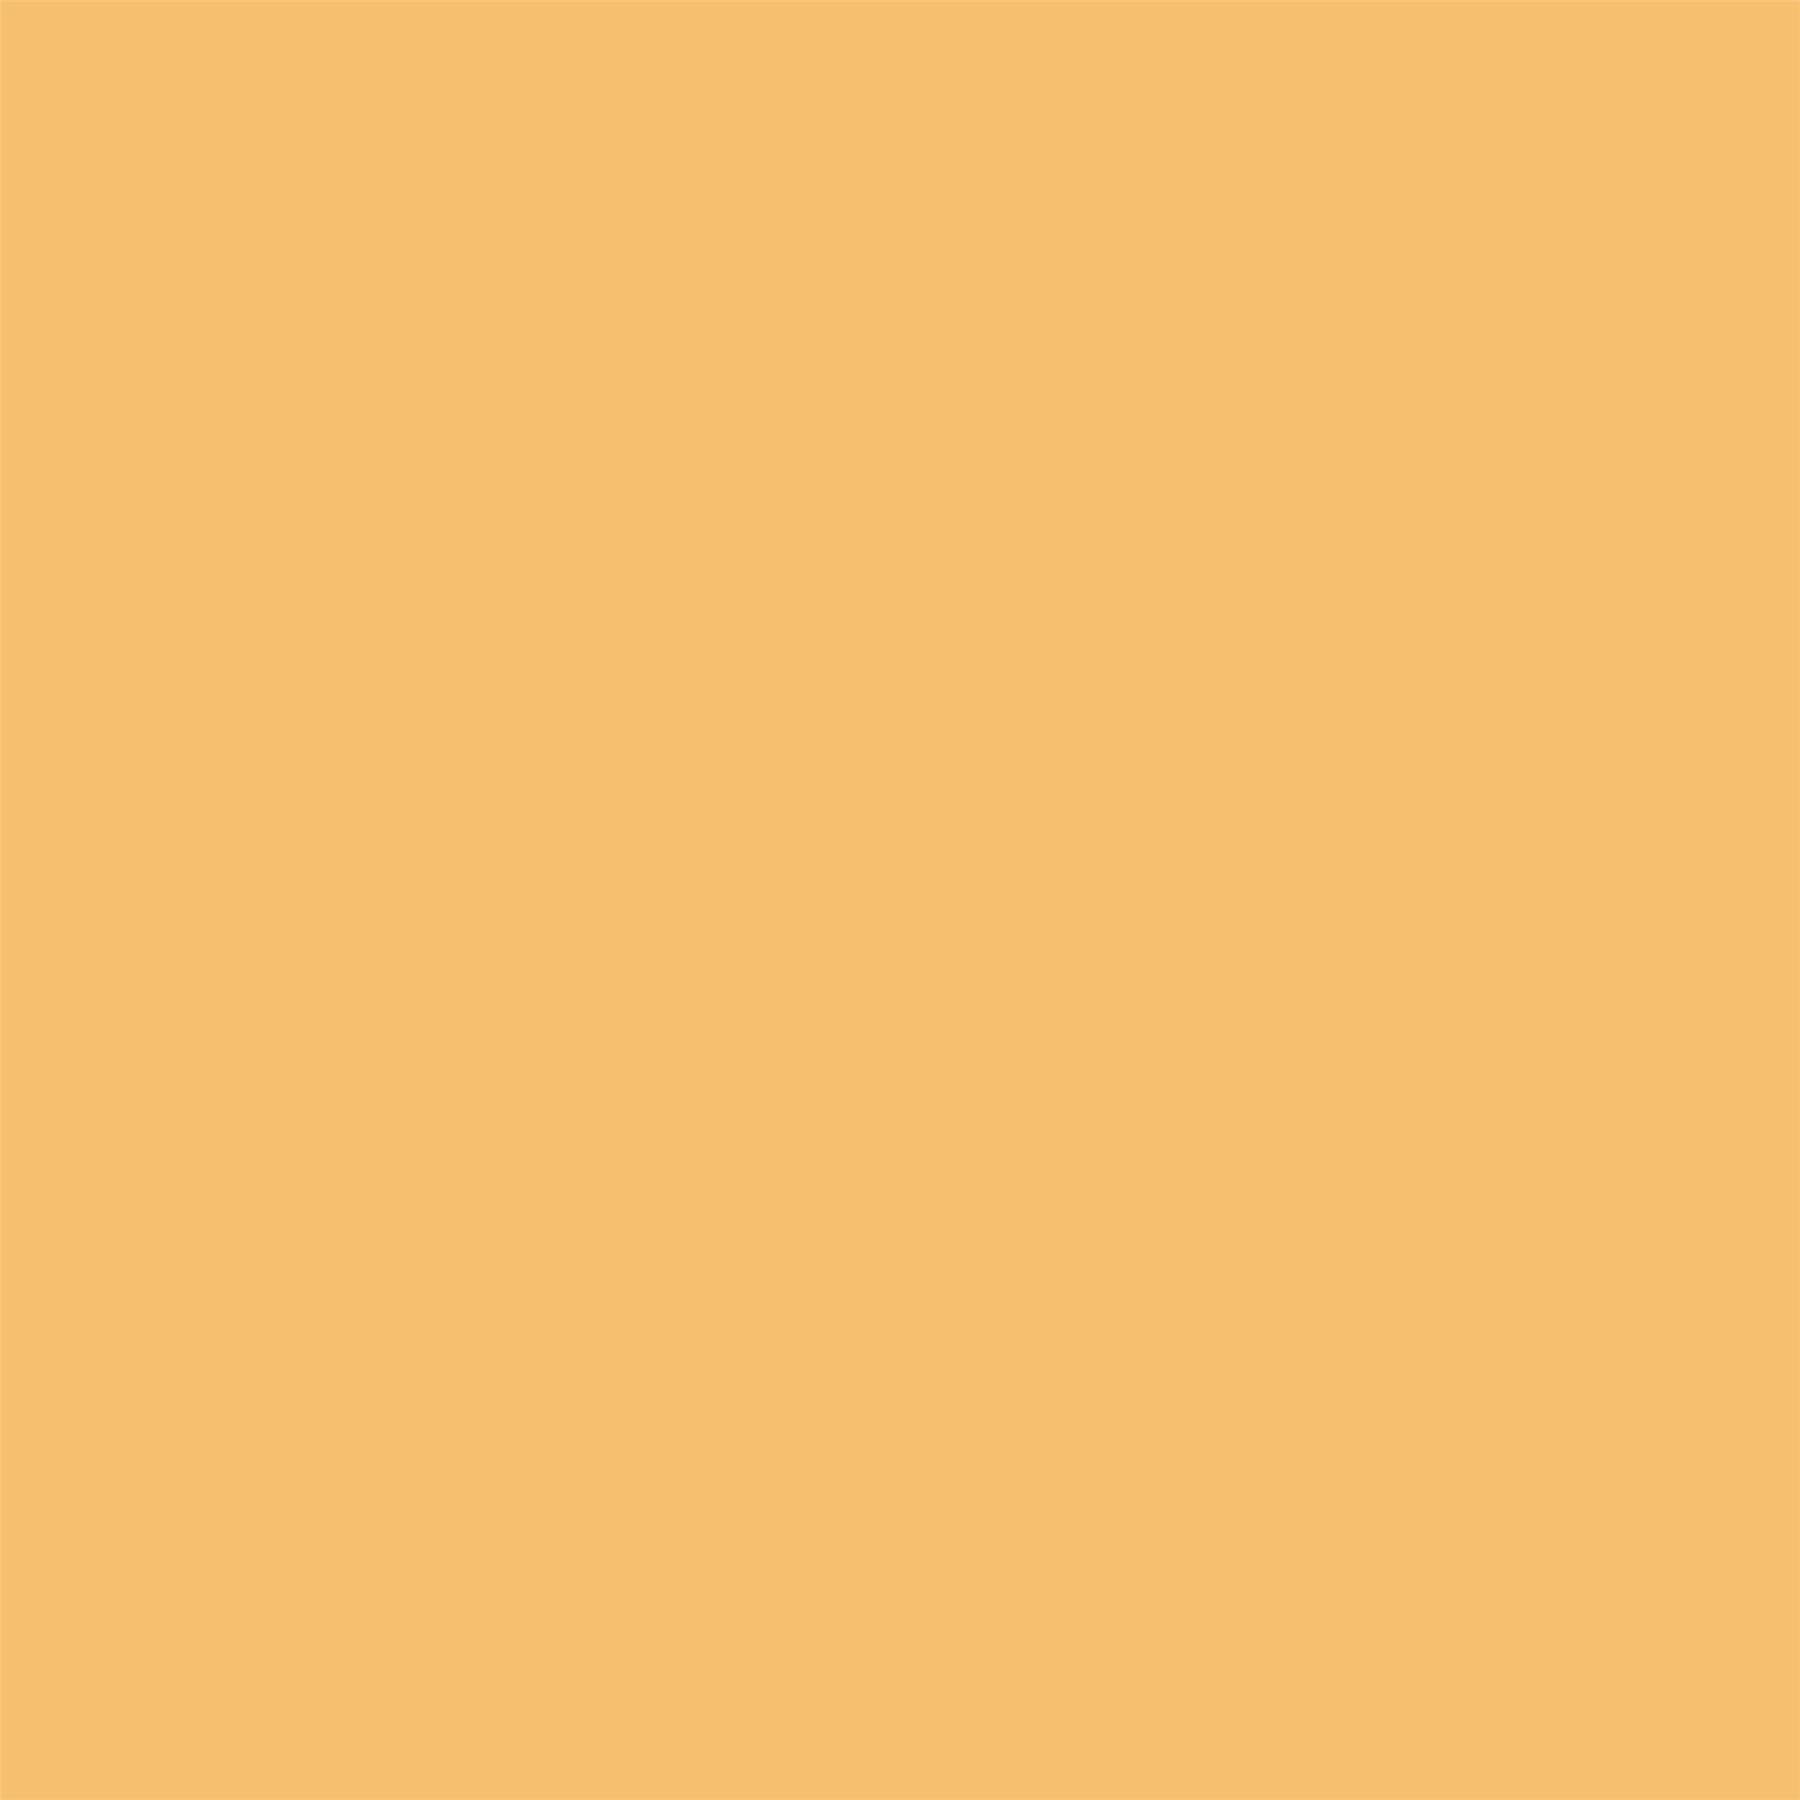 Winsor /& Newton Artista Gráfico único Promarker amarillos /& Oranges